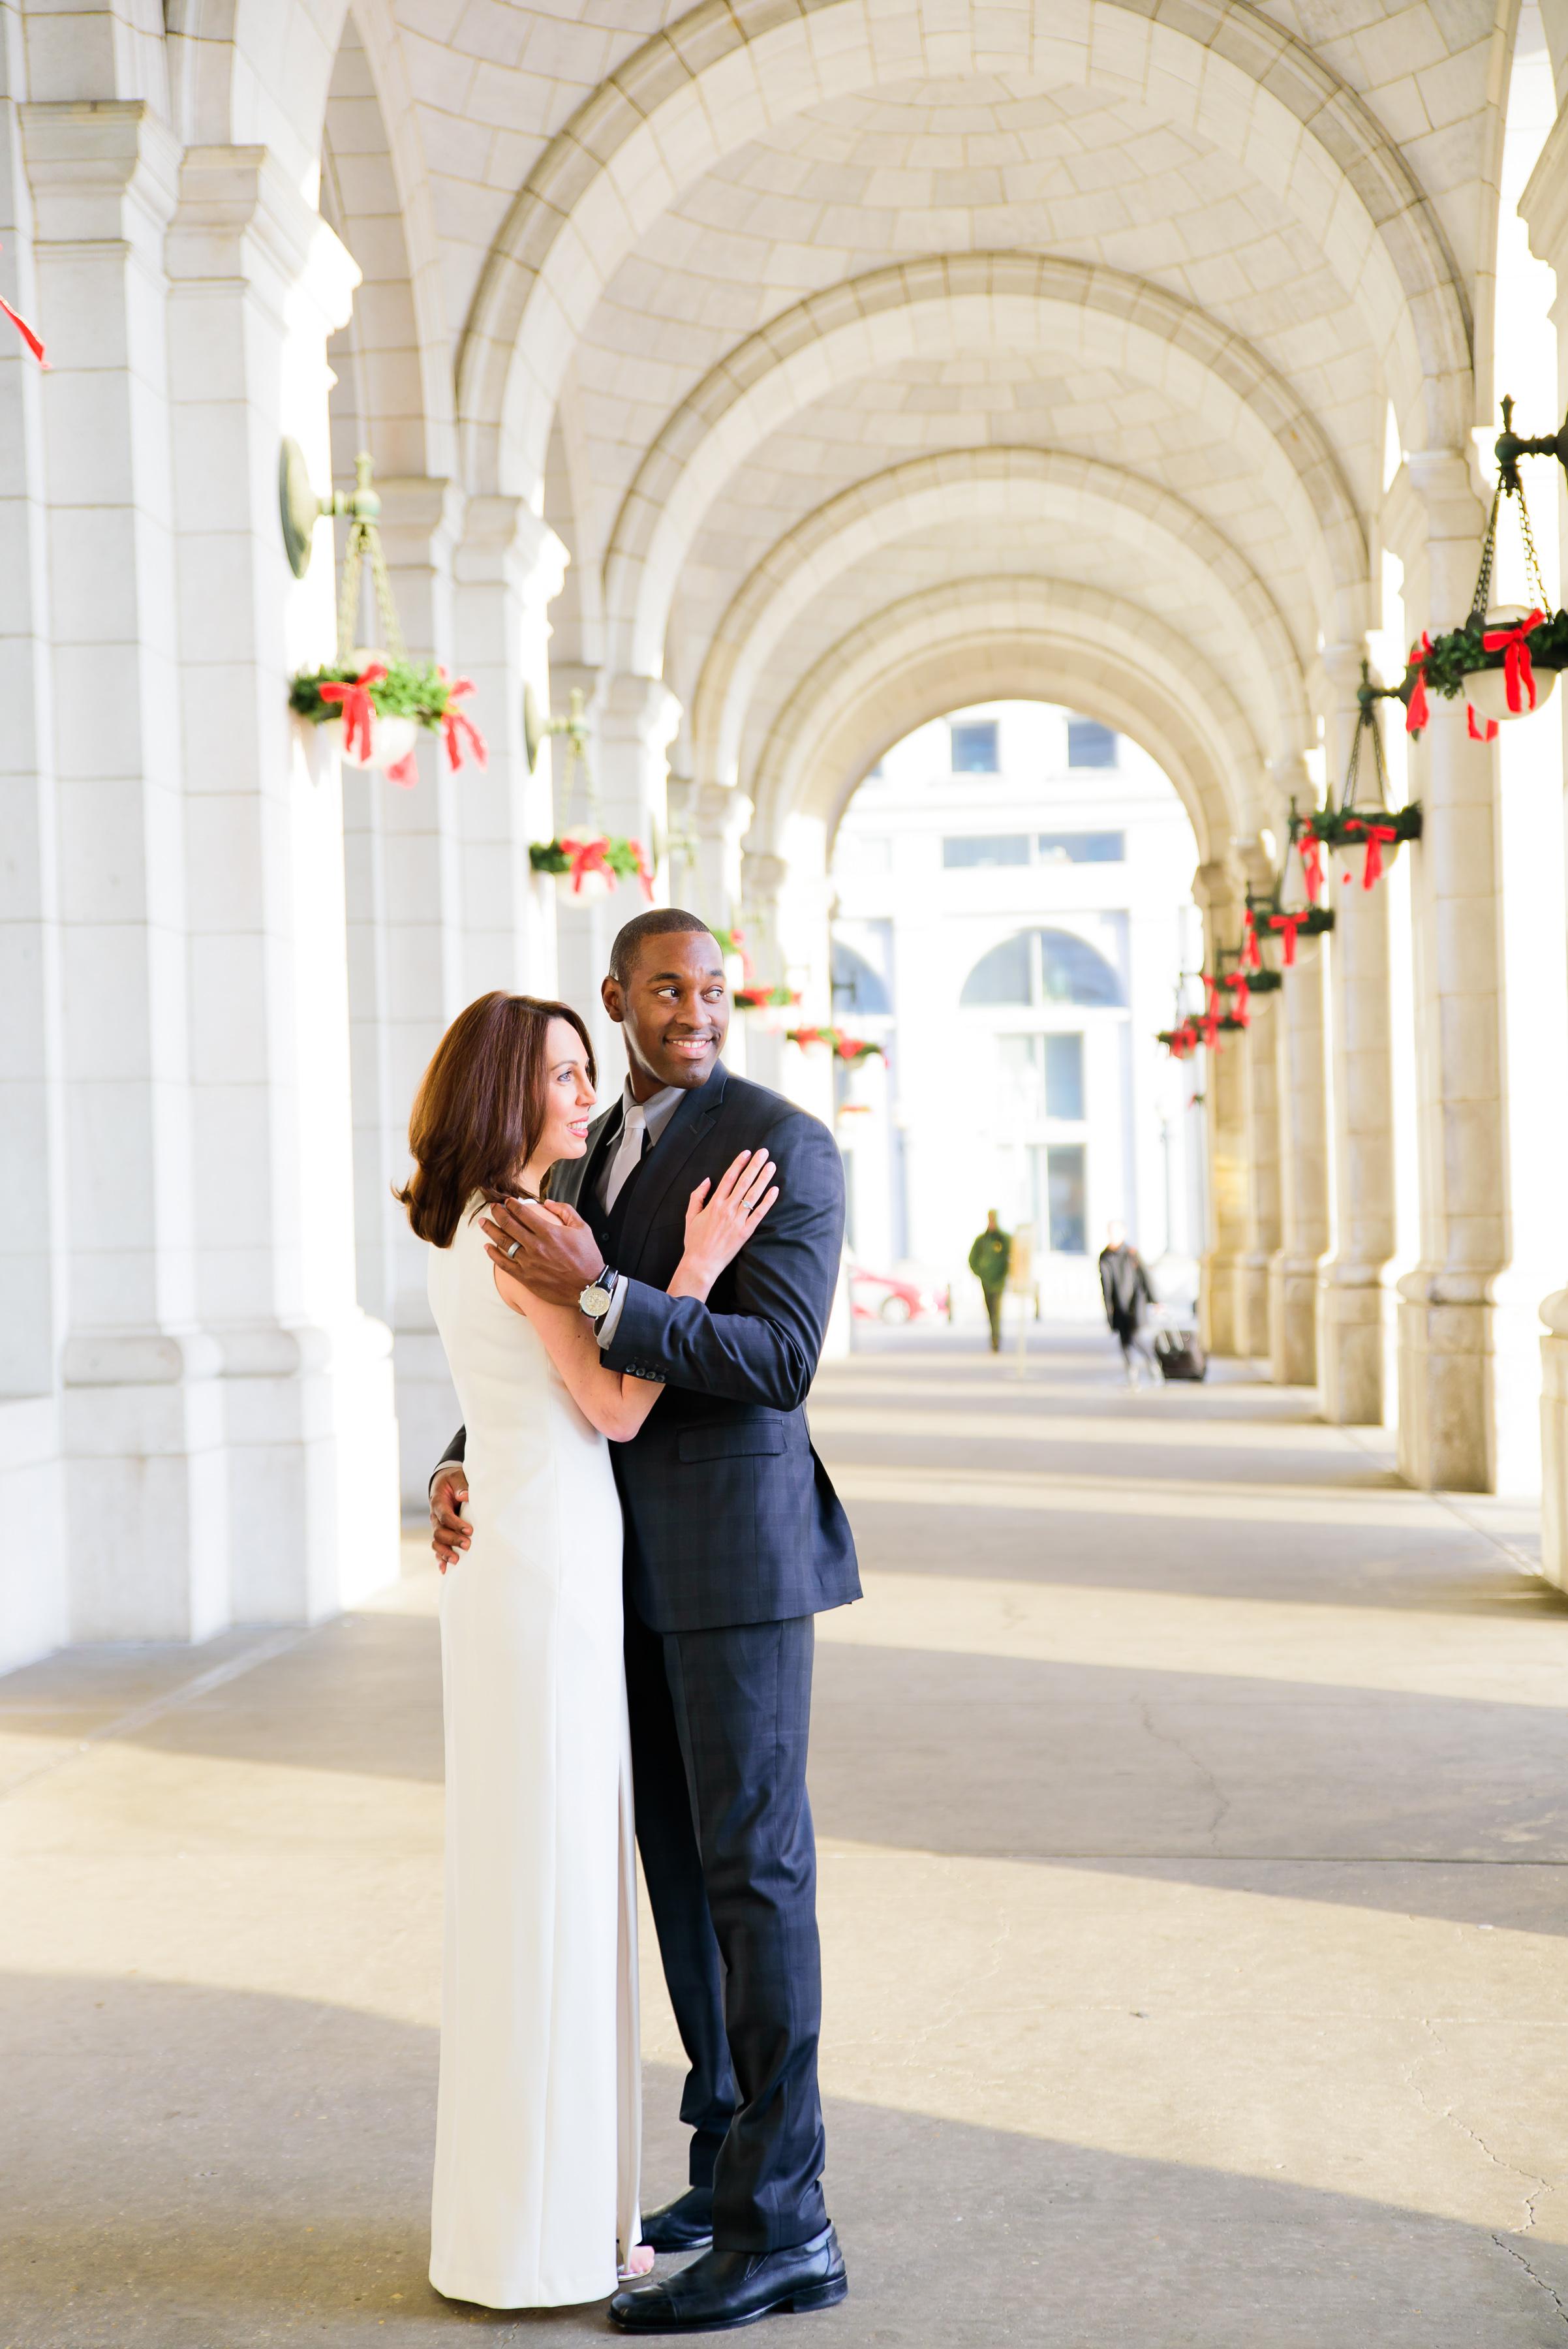 Union Station wedding DC